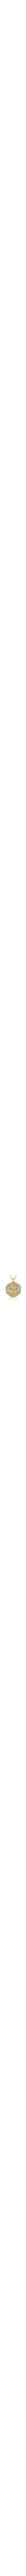 14K Gold Ten Commandments, Lion of Judah, royal design Pendant, white gold, yellow Gold, Jewish pendant ,Hebrew pendant